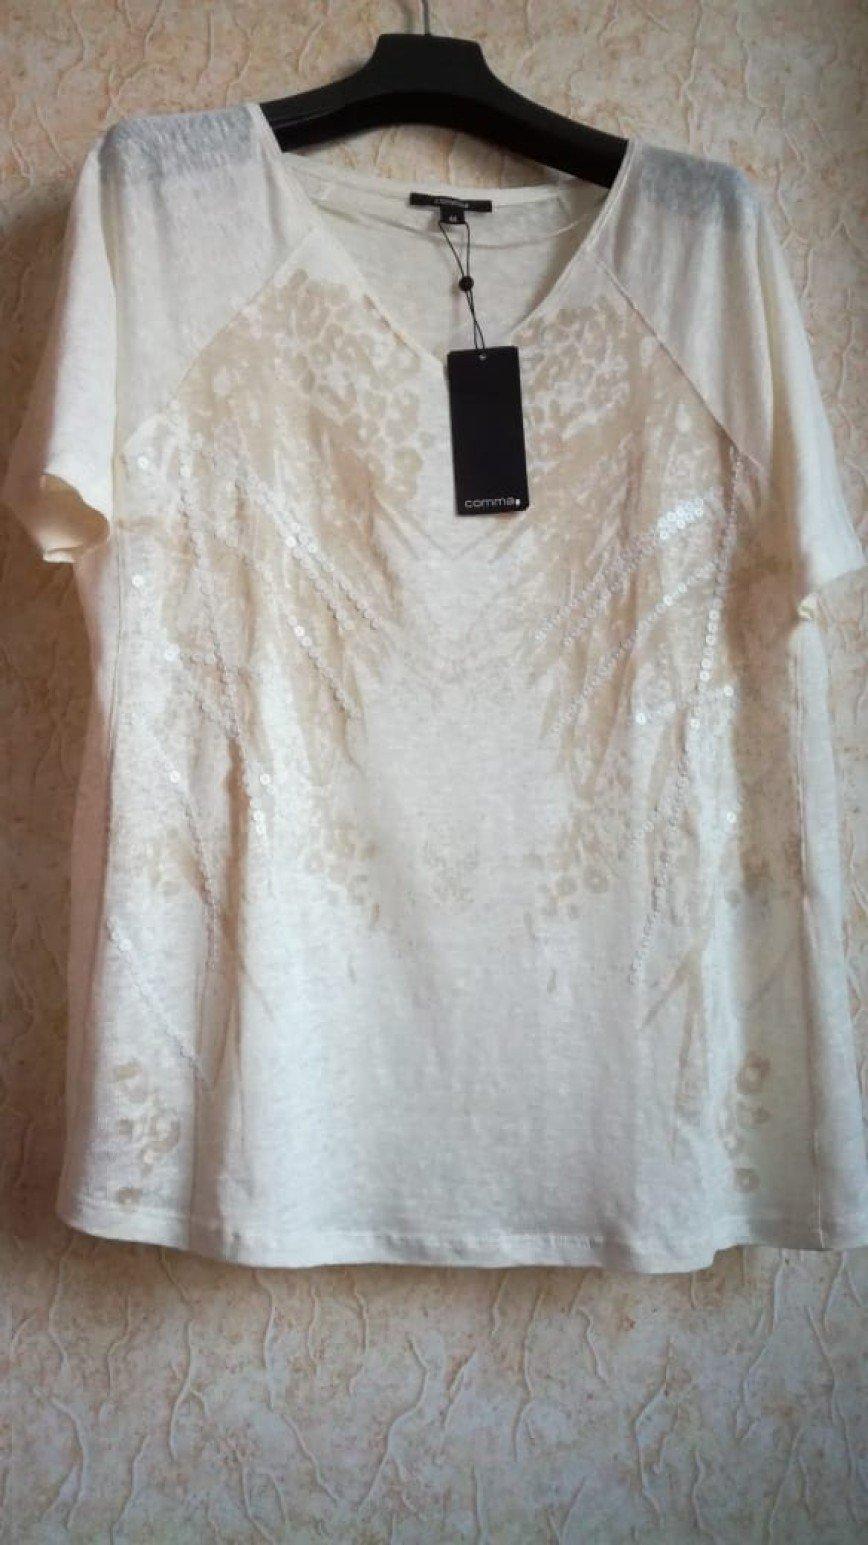 Новыя блузка Comma р.50 (маркировка 44), в тёплых бежевых тонах, украшена пайетками, 100%лён, made in Portugal. Цена 2000 руб.